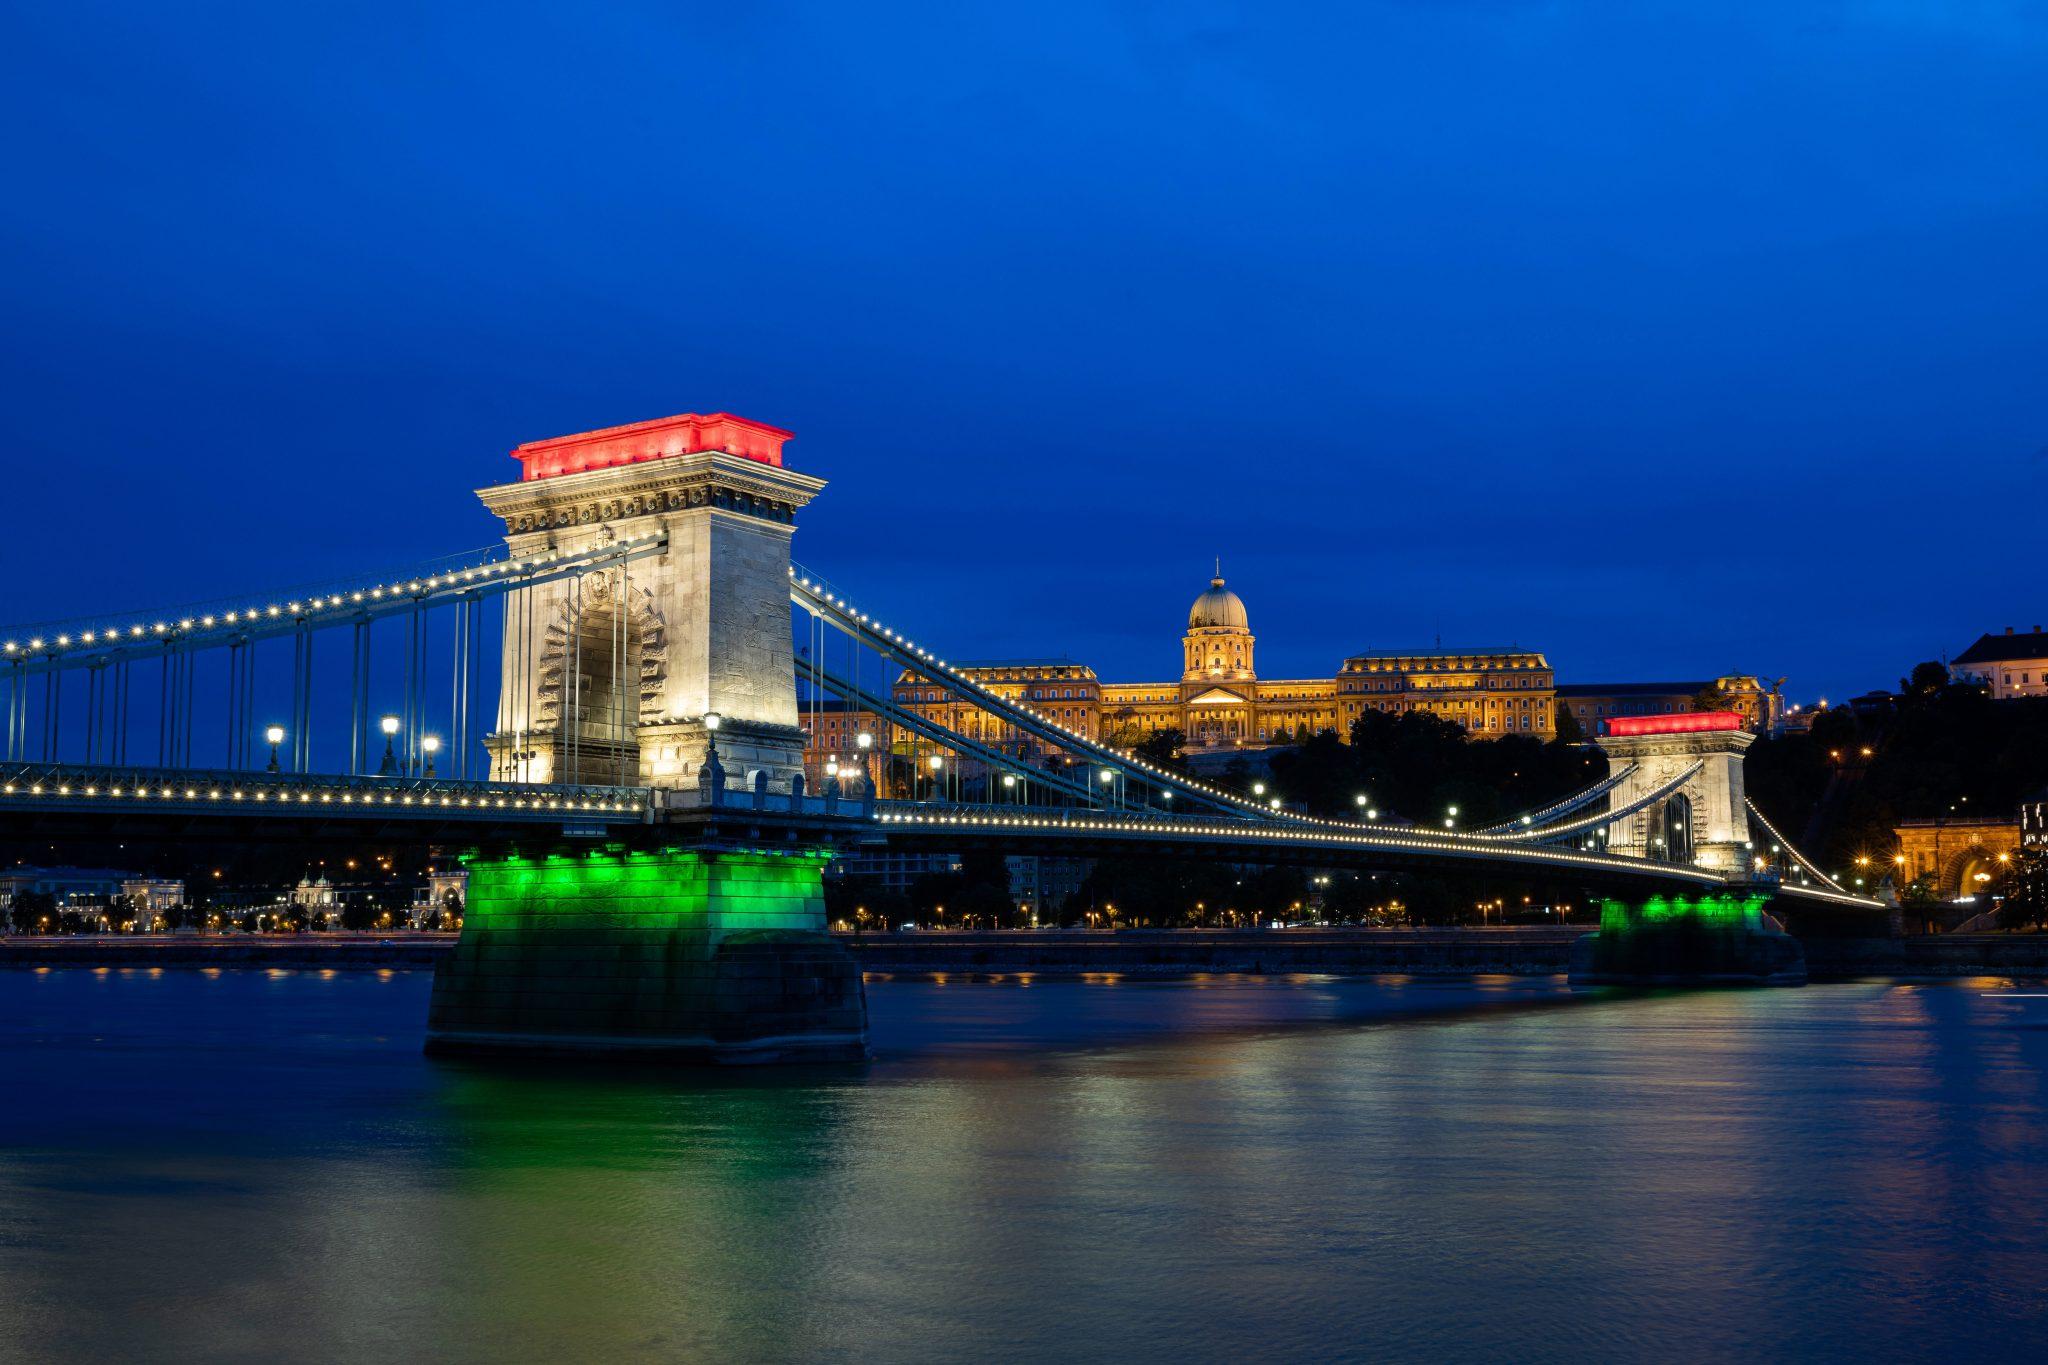 Star Actor Joseph Gordon-Levitt Asks for Photos of Hungary for New Project